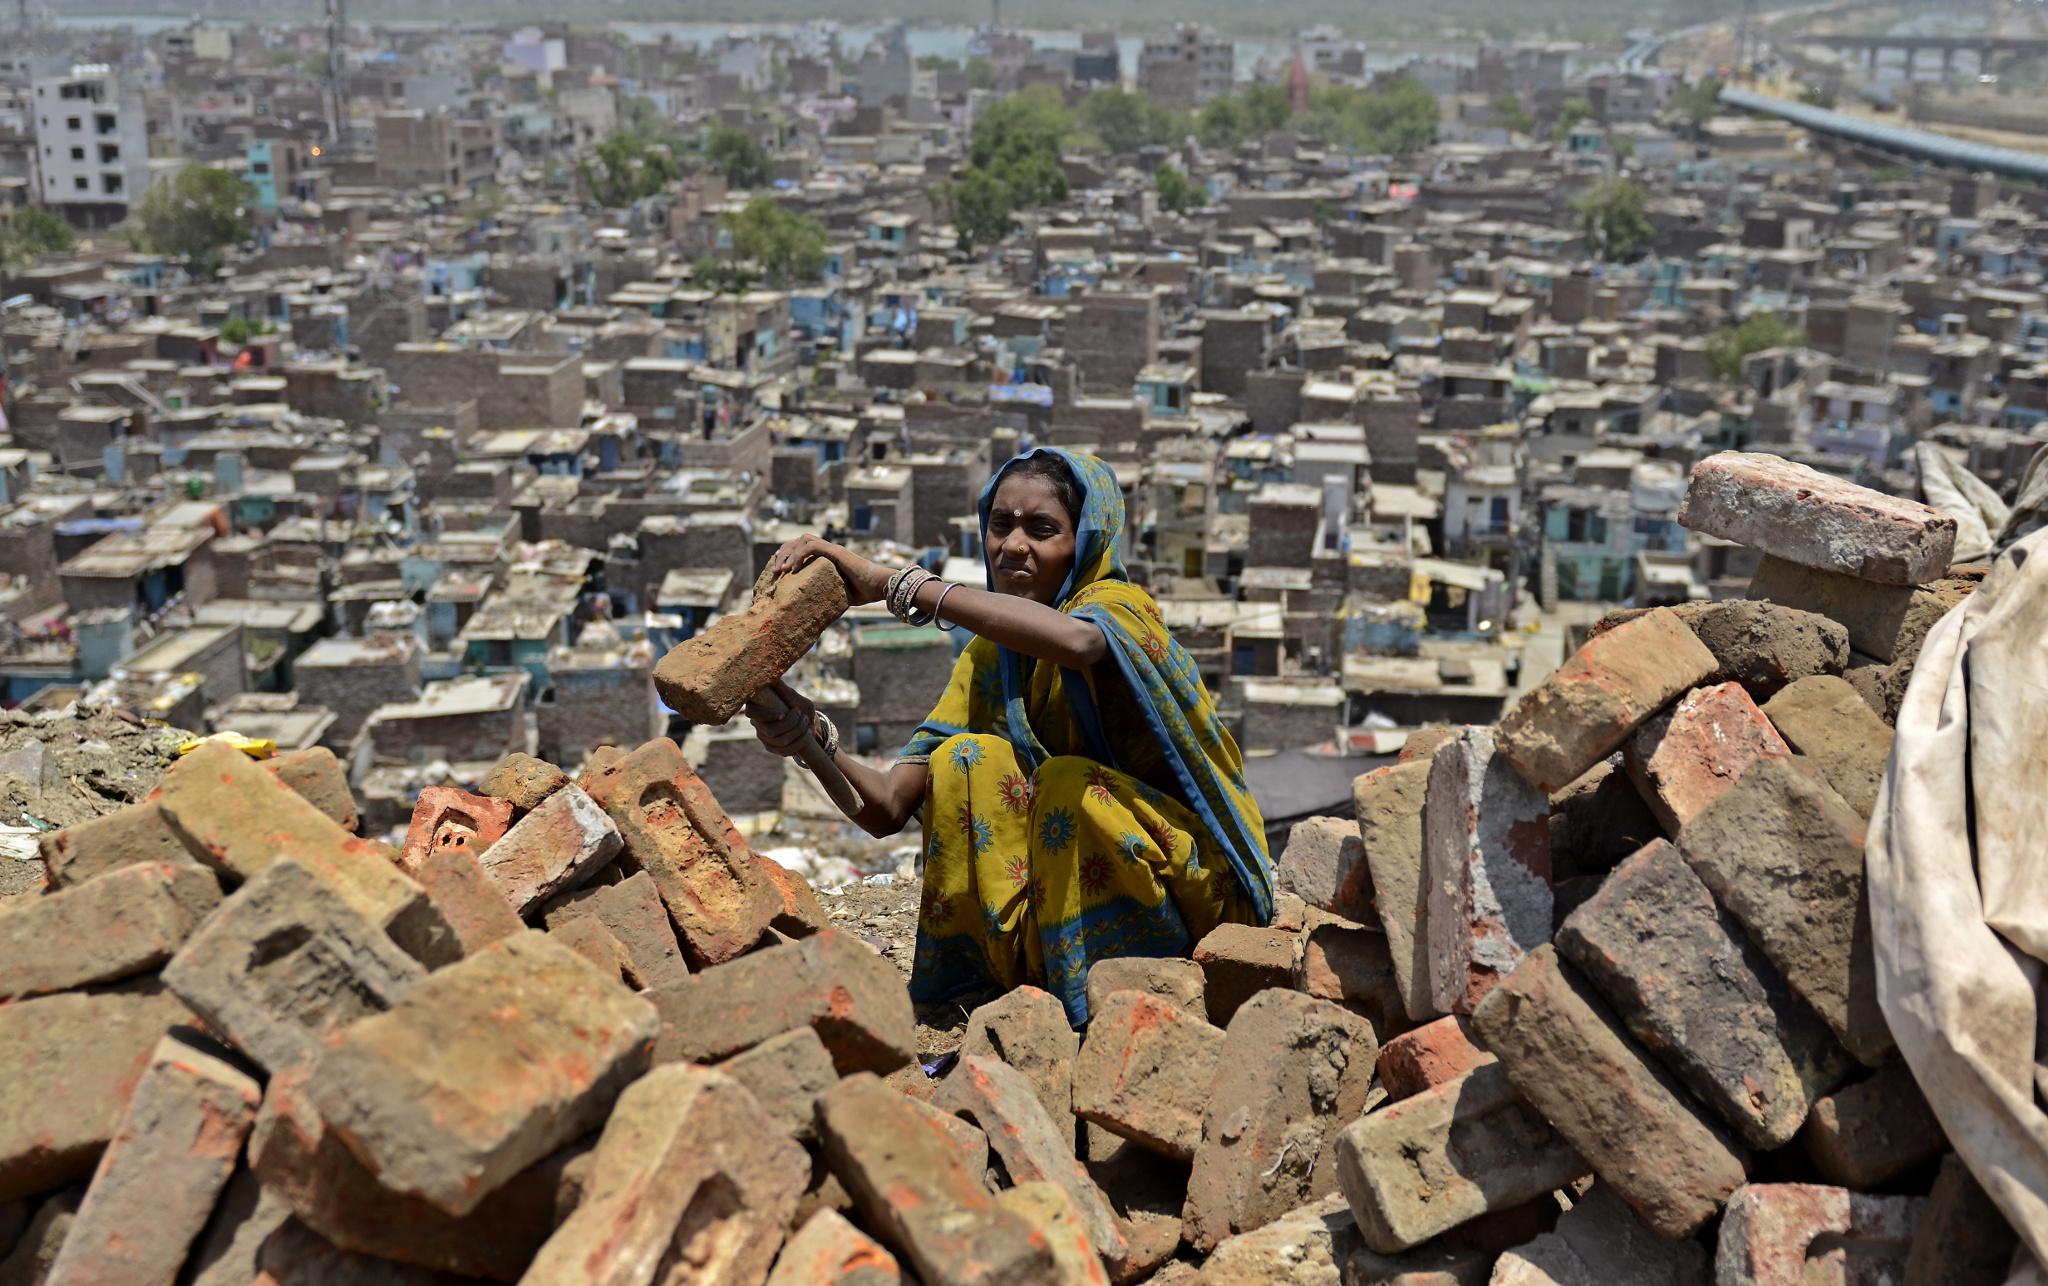 brick cleaning worker by Meeta Ahlawat on 500px